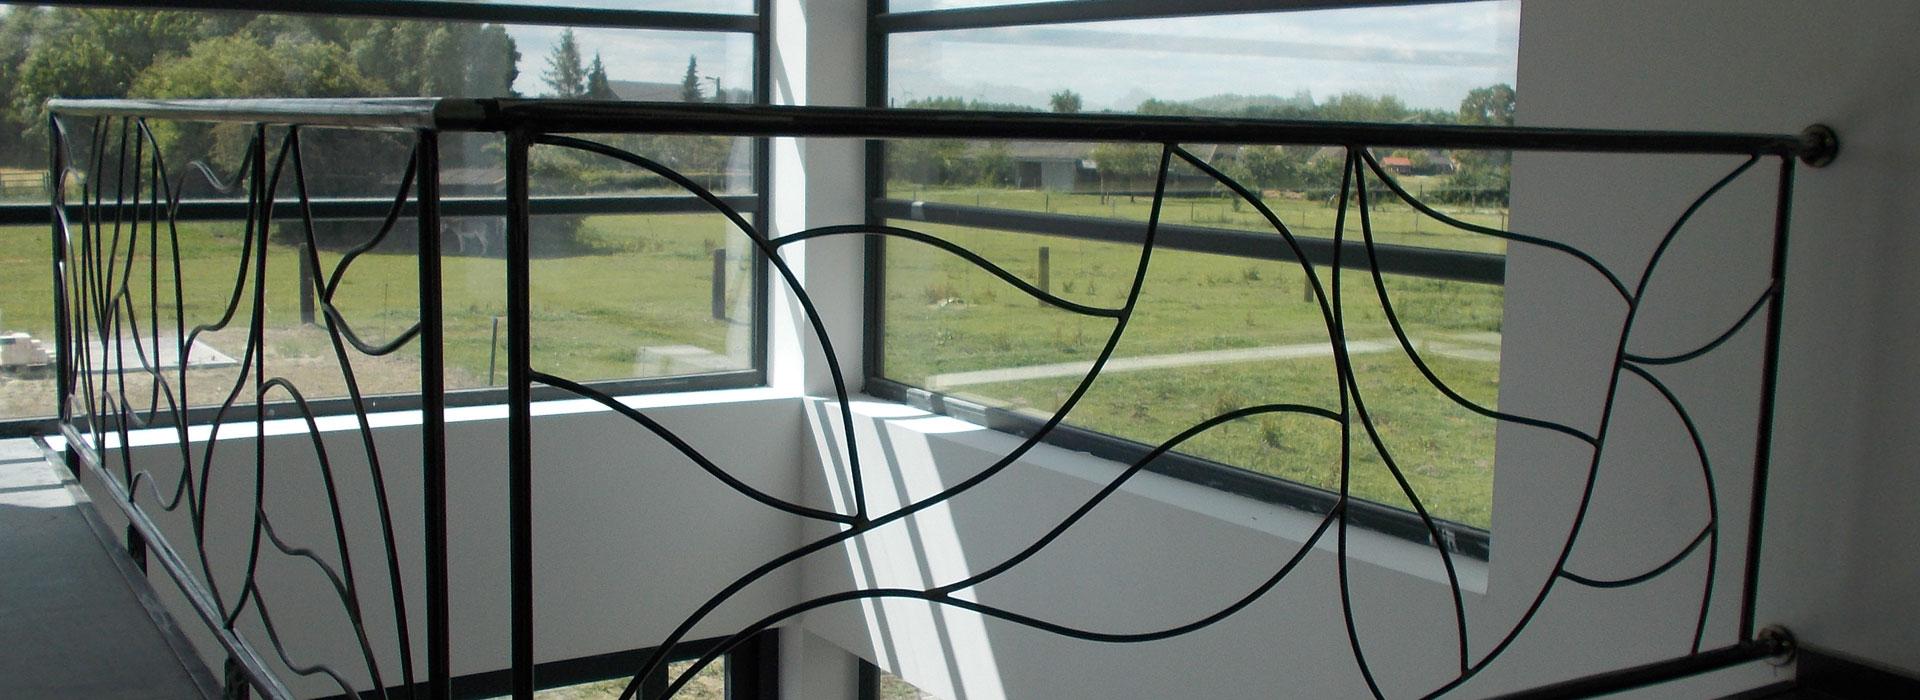 ferronnerie noulet accueil ferronnerie tournai ferronnerie d 39 art portail en fer forg. Black Bedroom Furniture Sets. Home Design Ideas